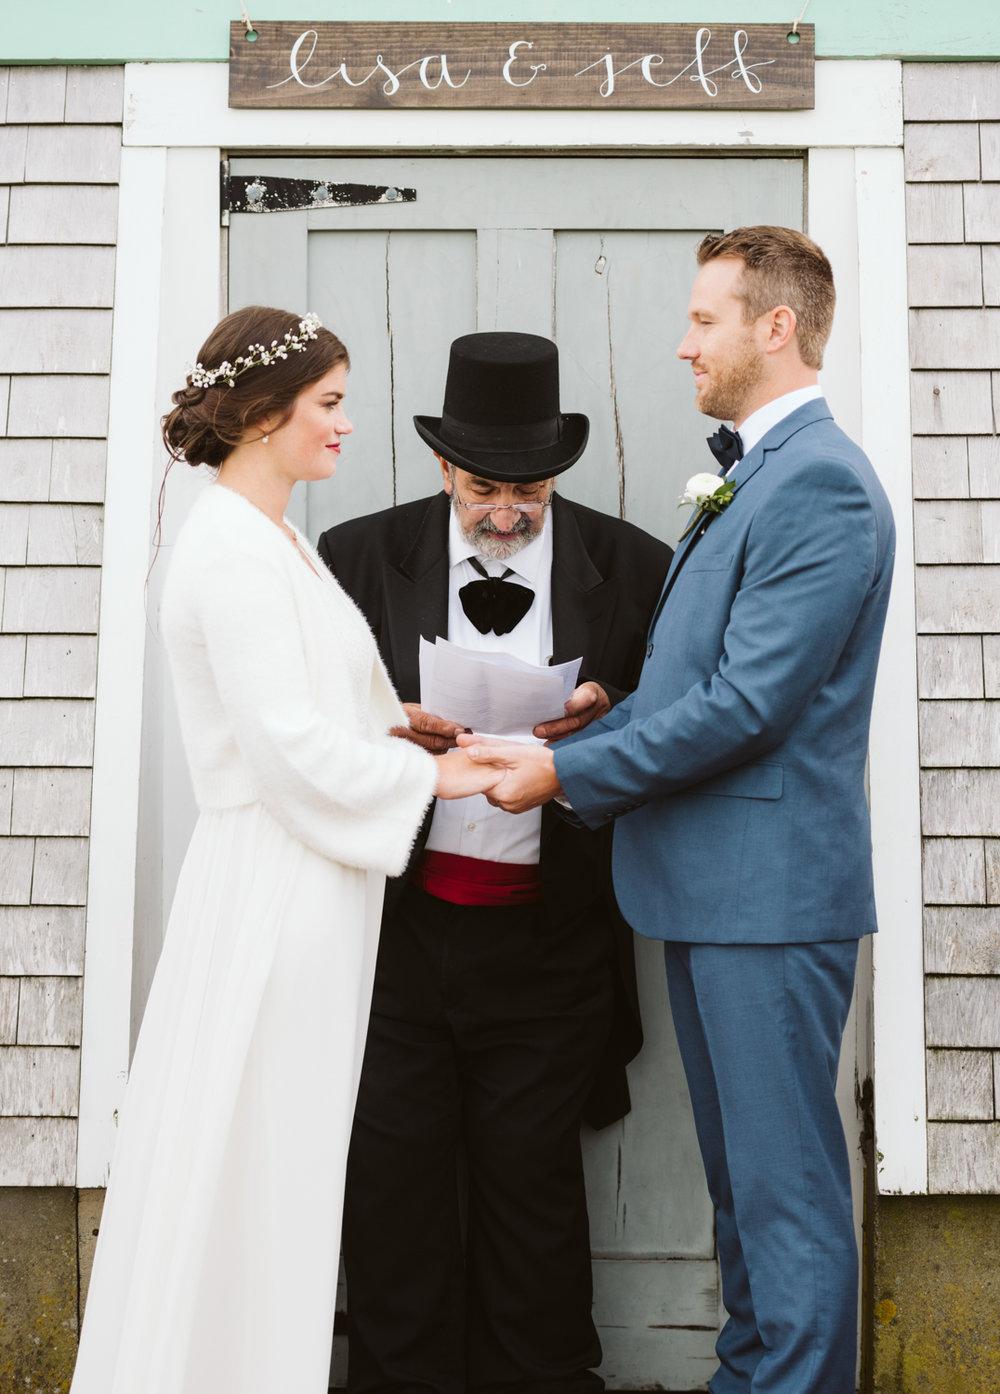 wedding_ocean_park_marthas_vineyardDSC_1778.jpg